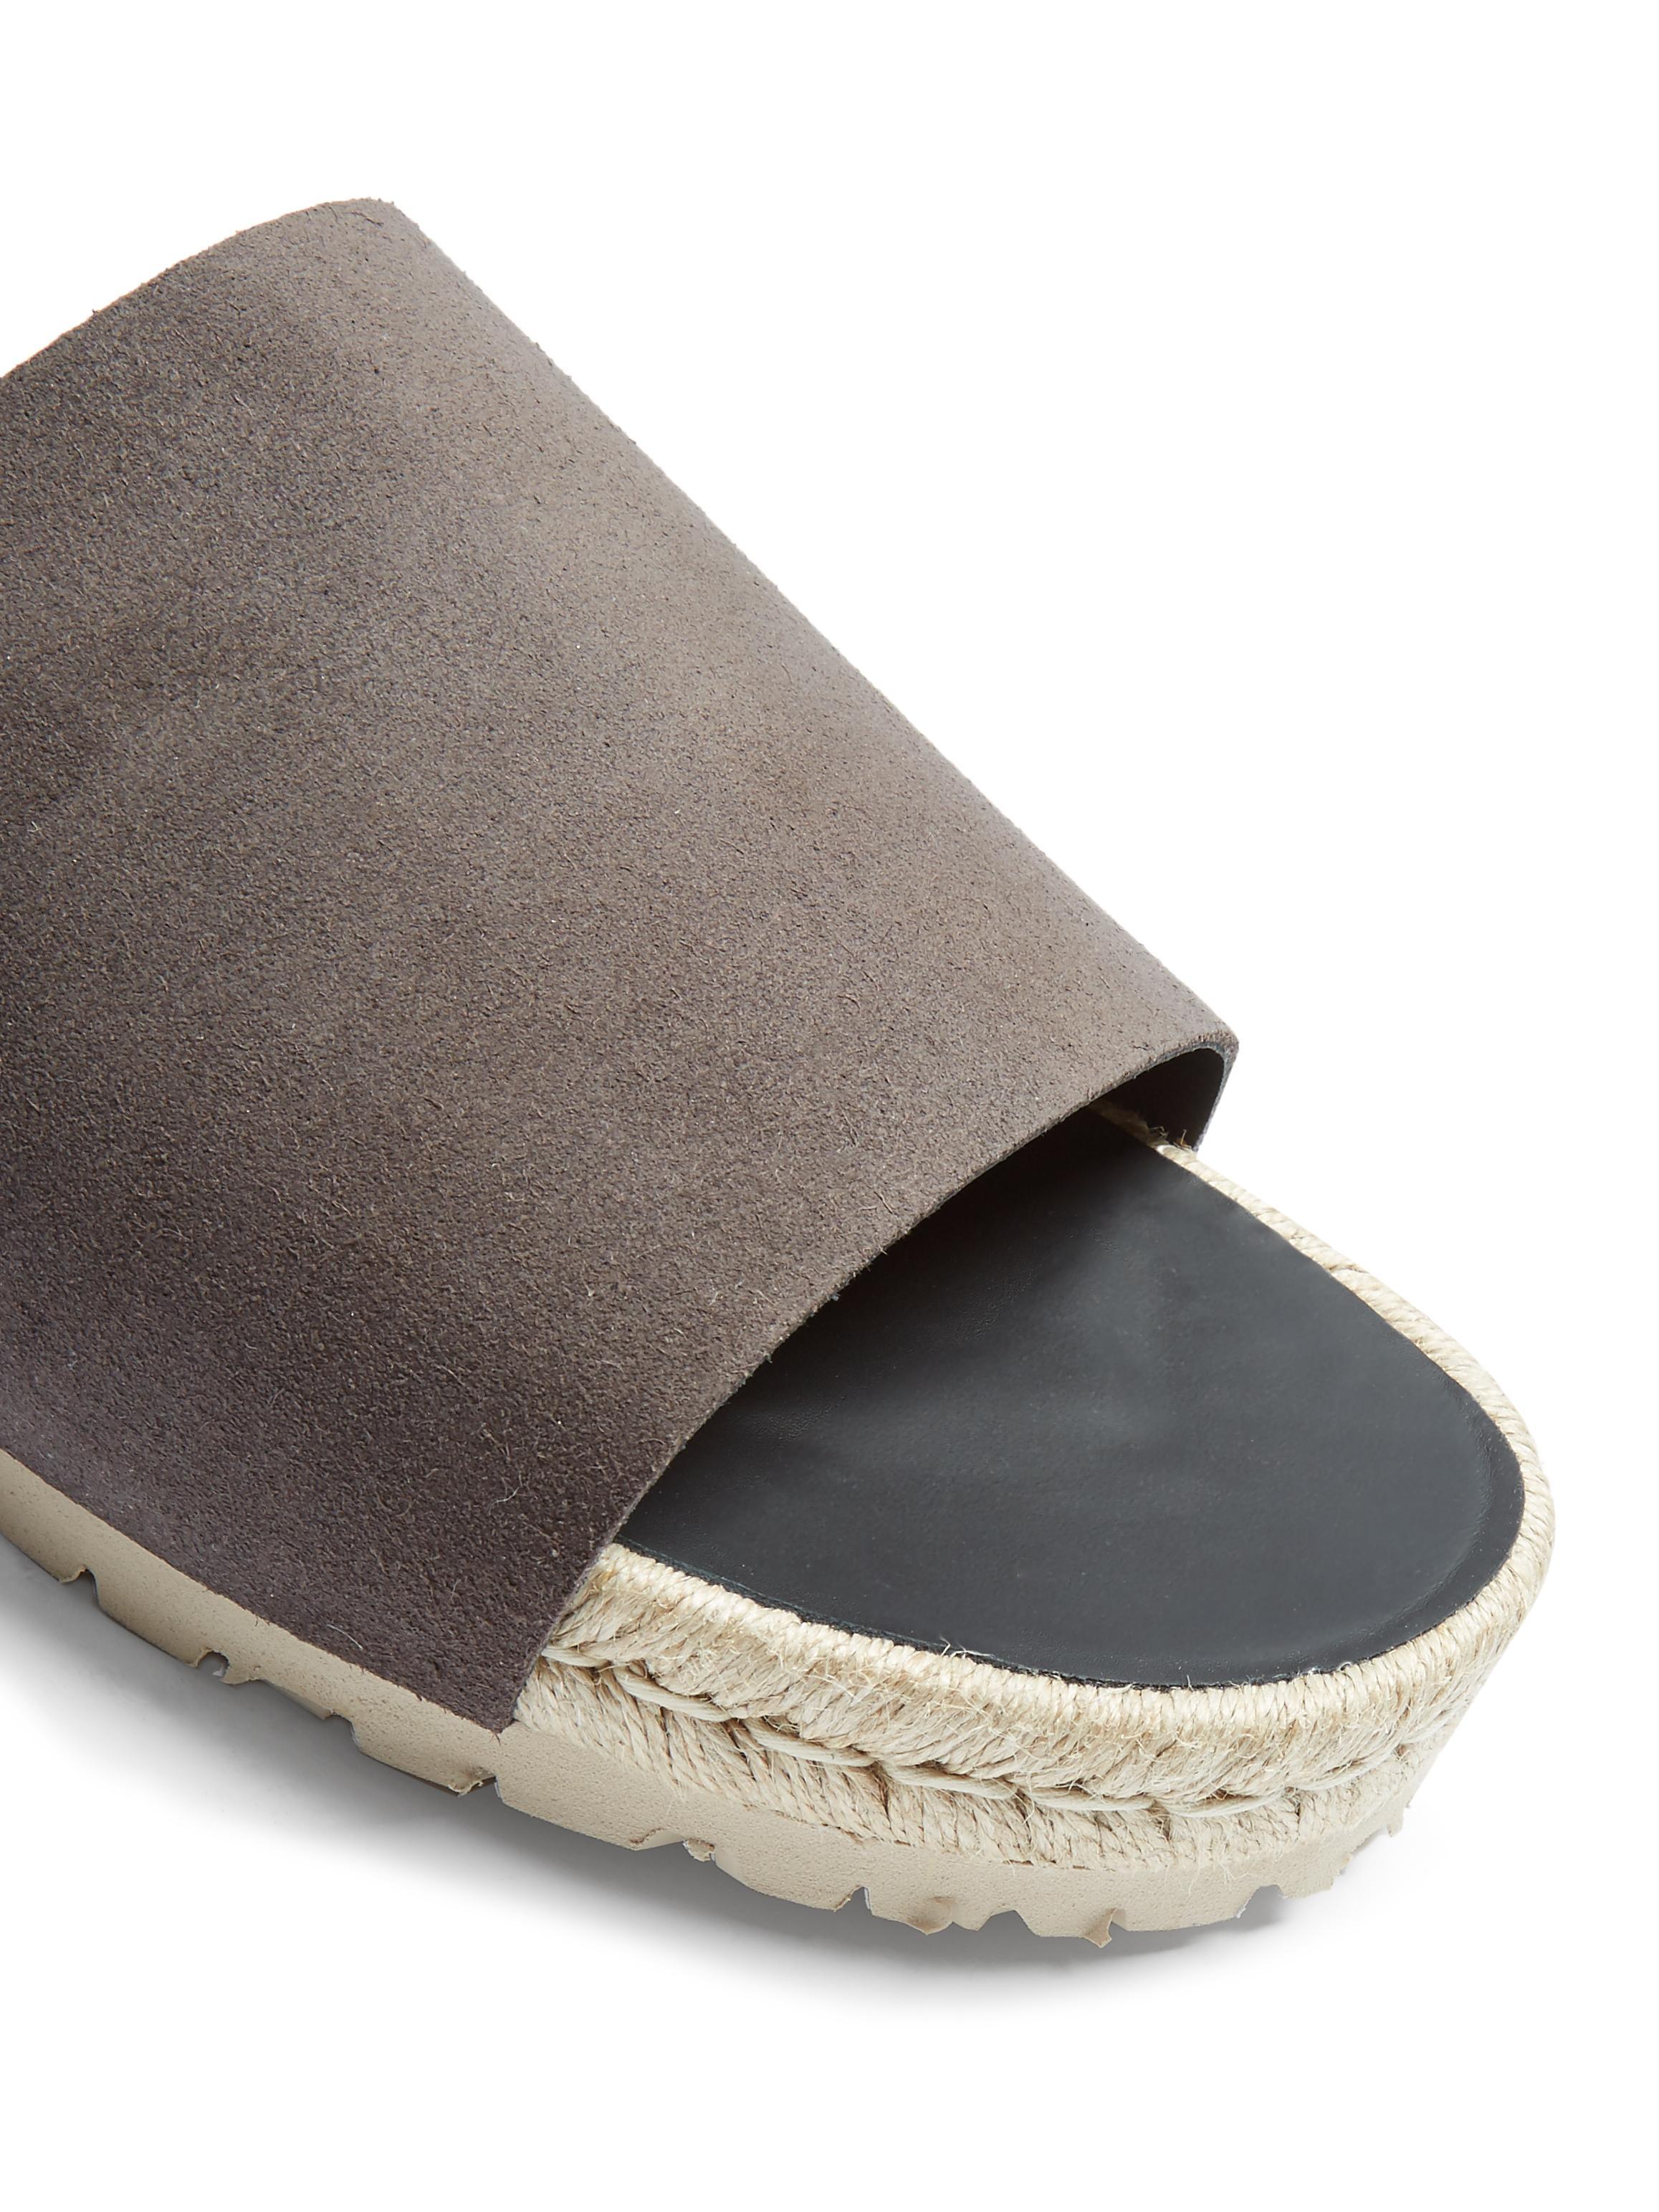 Balenciaga Suede Slides In Grey Gray For Men Lyst